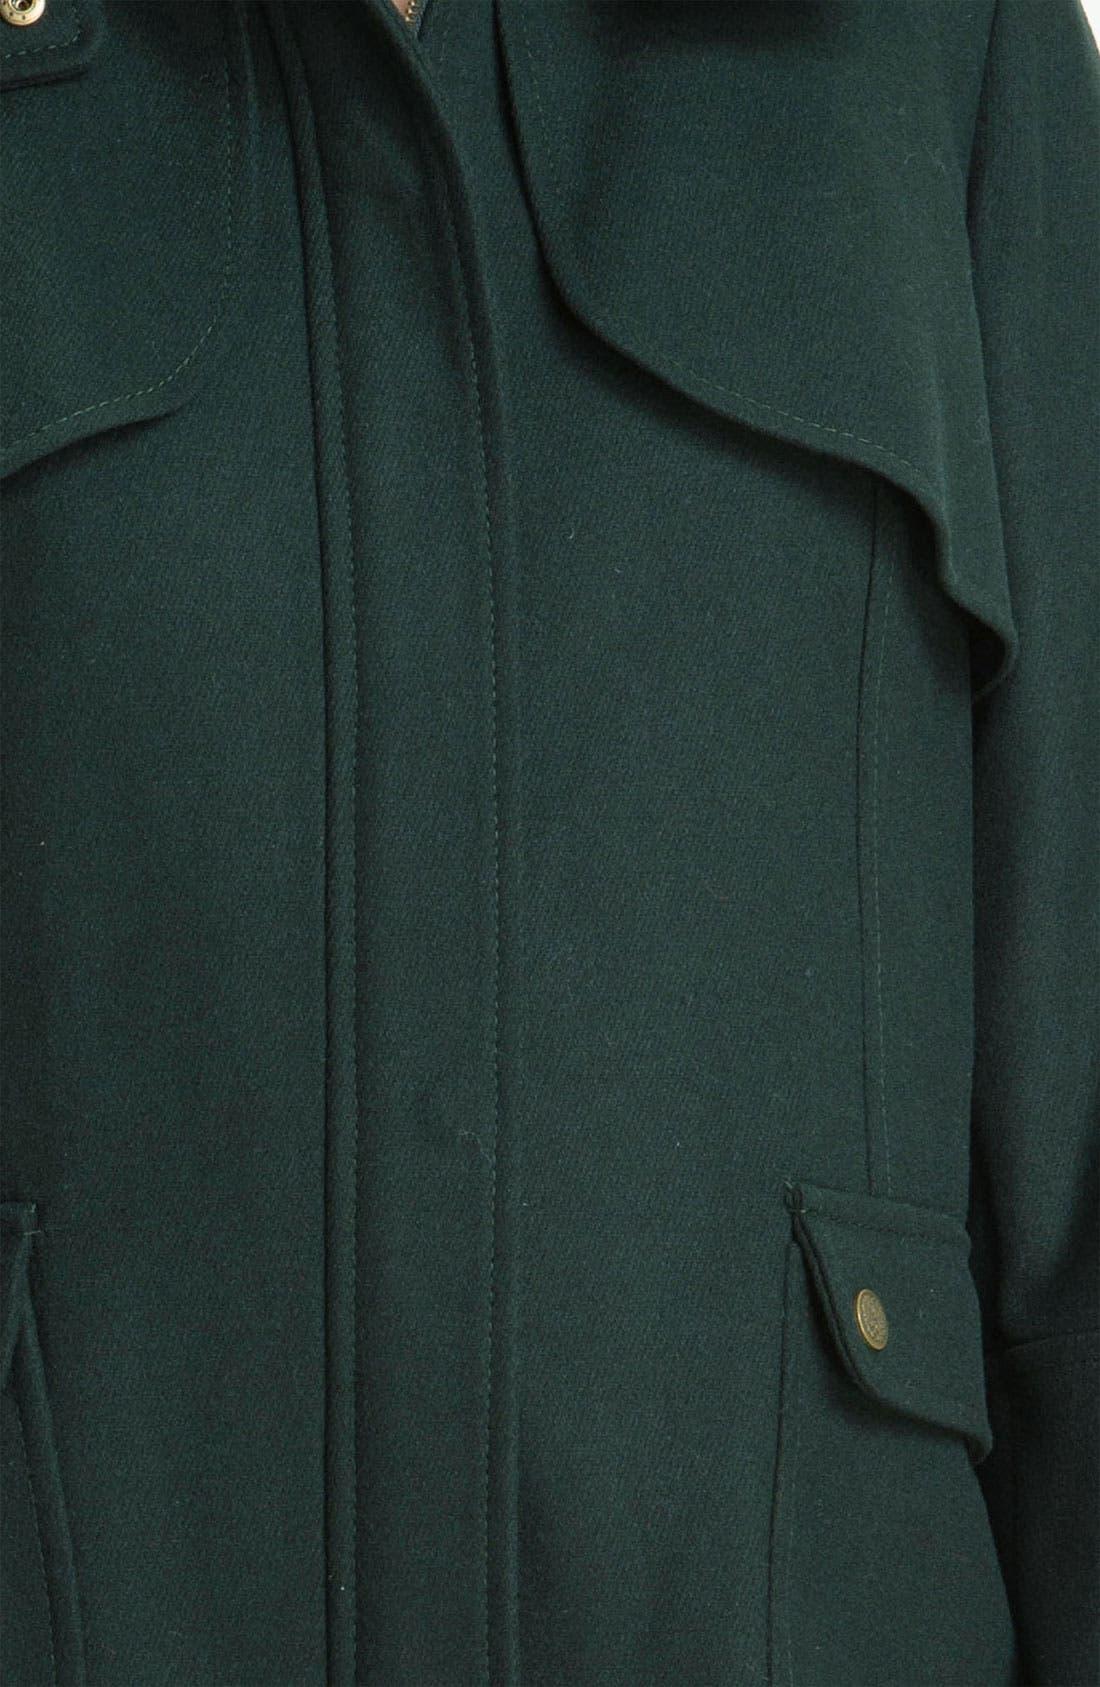 Wool Blend Jacket with Detachable Hood,                             Alternate thumbnail 2, color,                             300